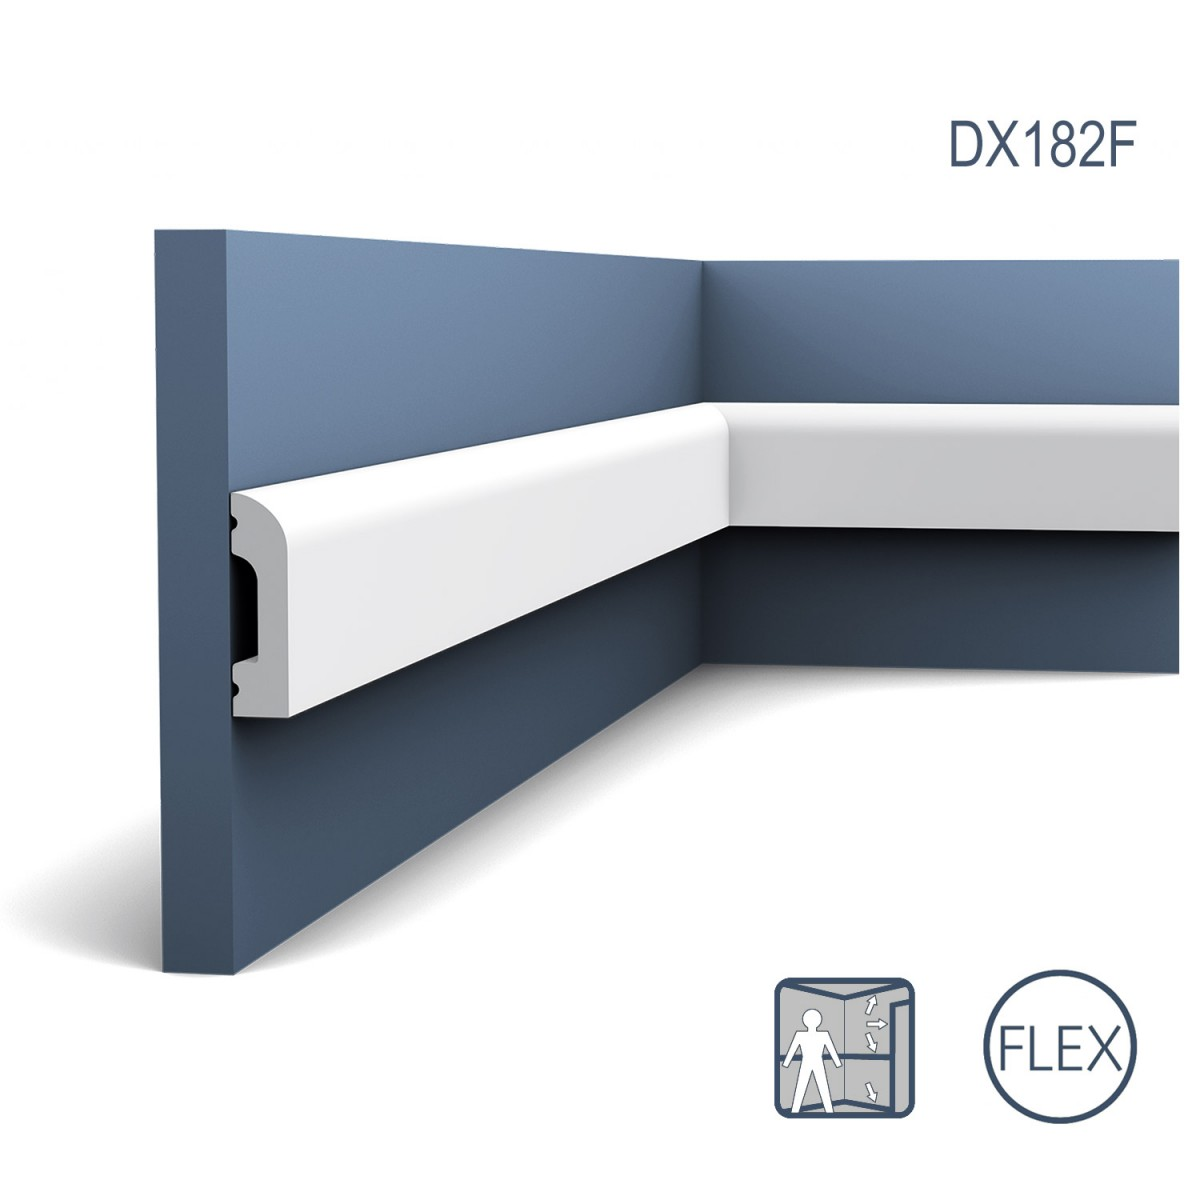 Plinta Flex Axxent SX182F, Dimensiuni: 200 X 1.3 X 5 cm, Orac Decor